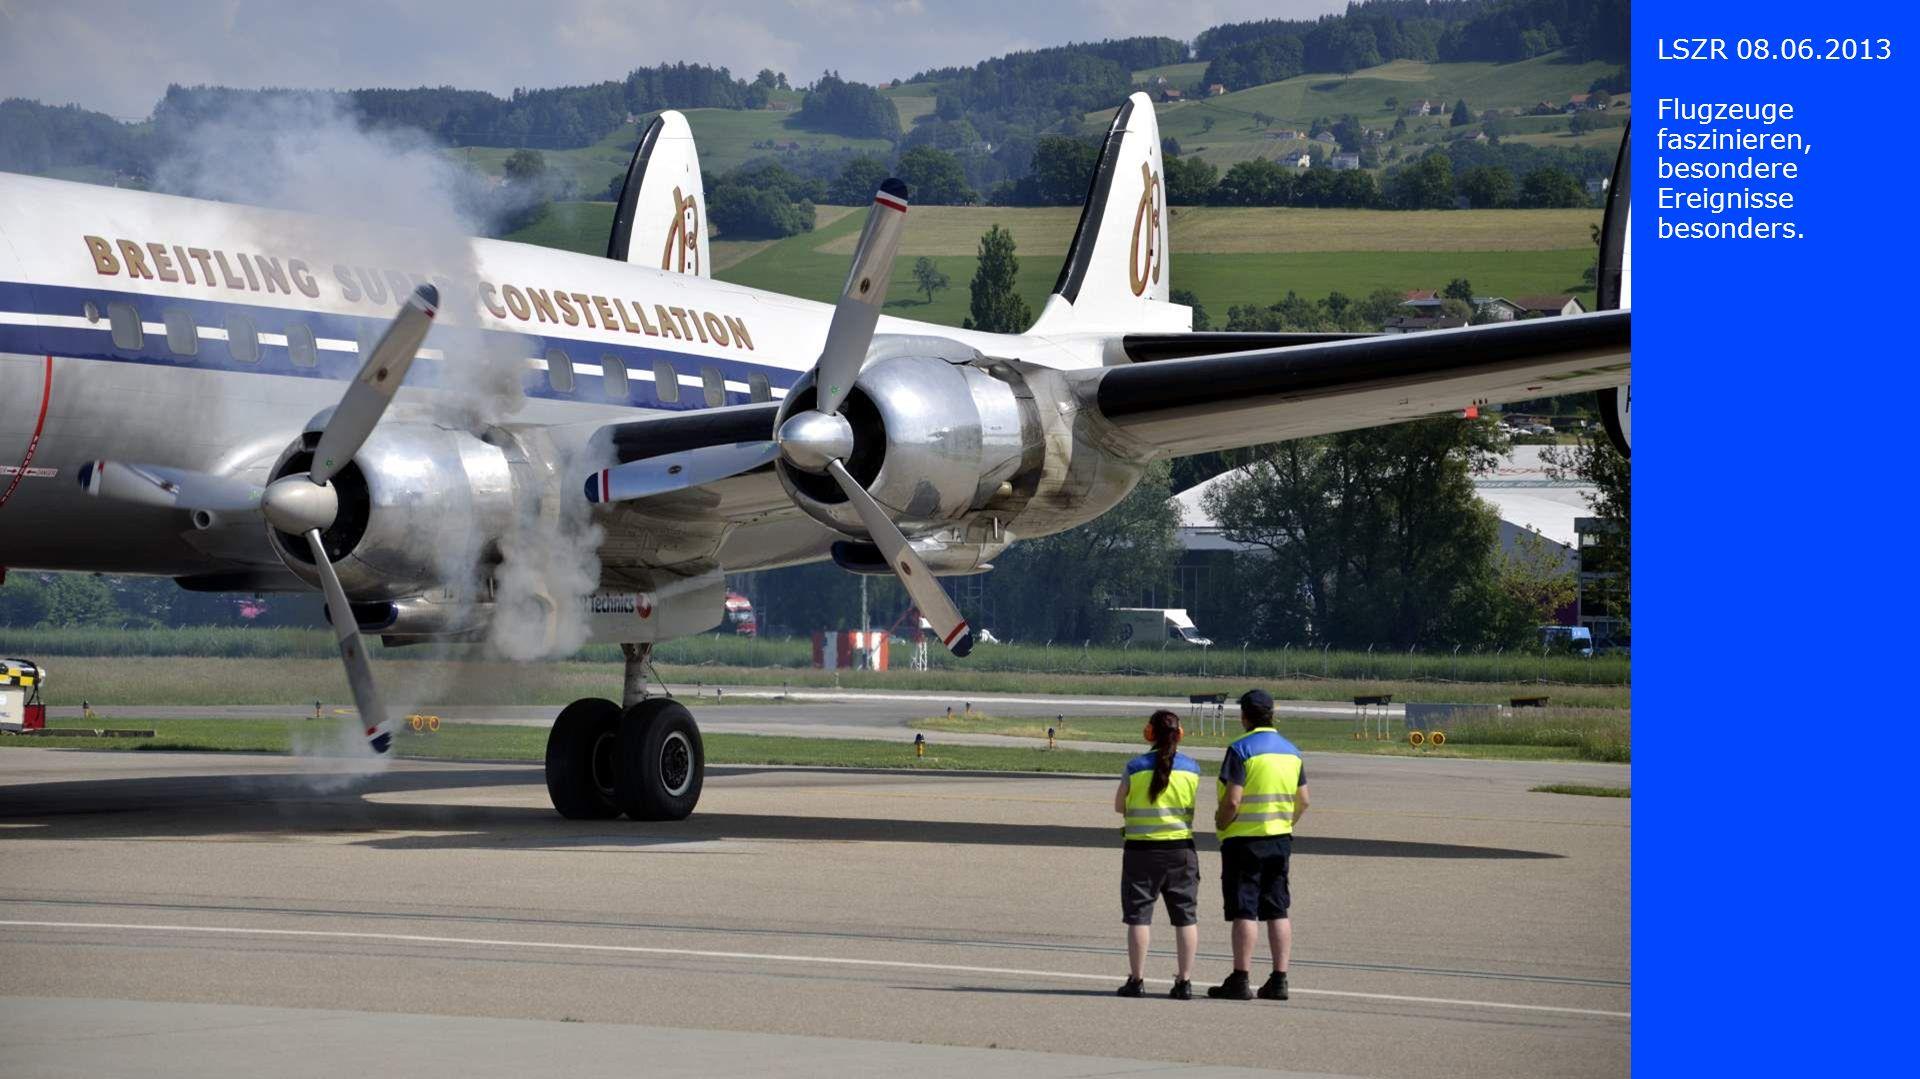 LSZR 08.06.2013 Flugzeuge faszinieren, besondere Ereignisse besonders.